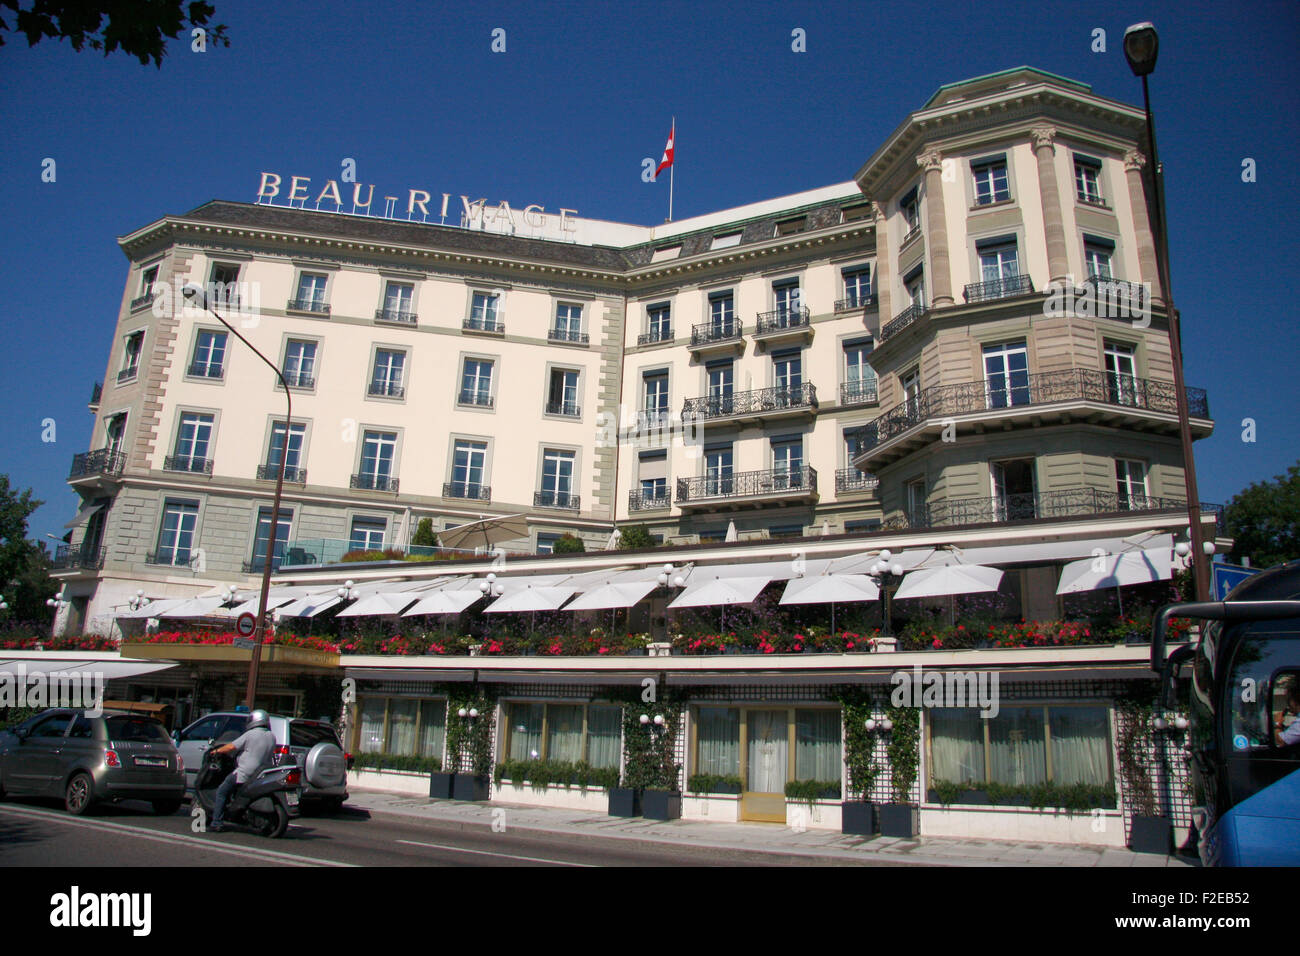 das Hotel 'Beau Rivage', in dem Uwe Barschel gestoeben war, Genfer See, Genf, Schweiz. - Stock Image